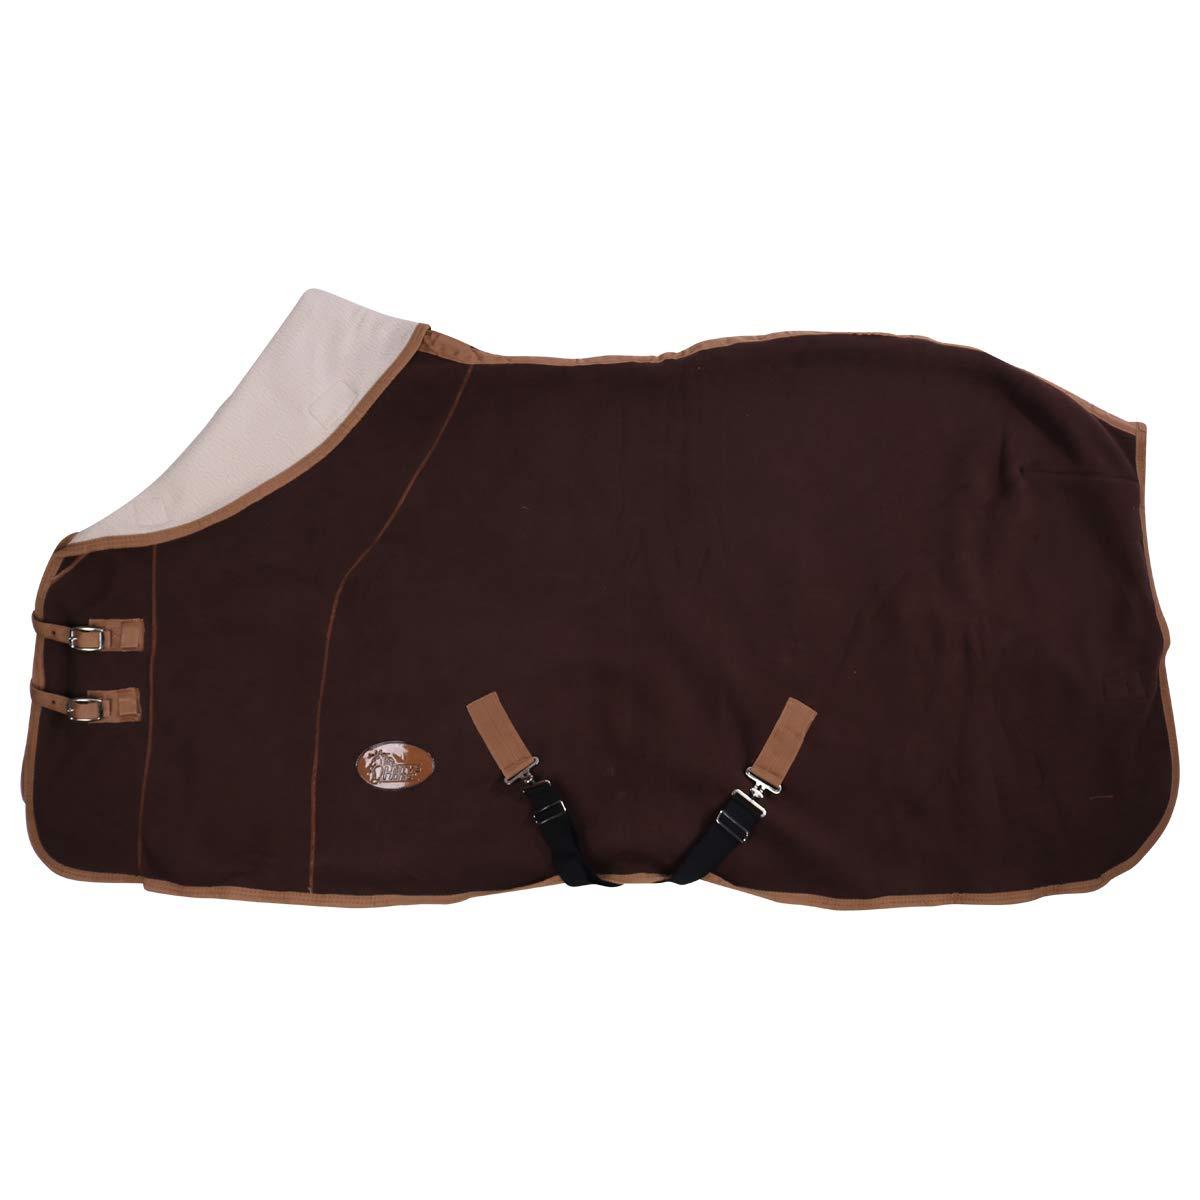 Harry's Horse 32200393-03155cm Teddyfleece Decke 1/2 Hals, L, braun Harry' s Horse